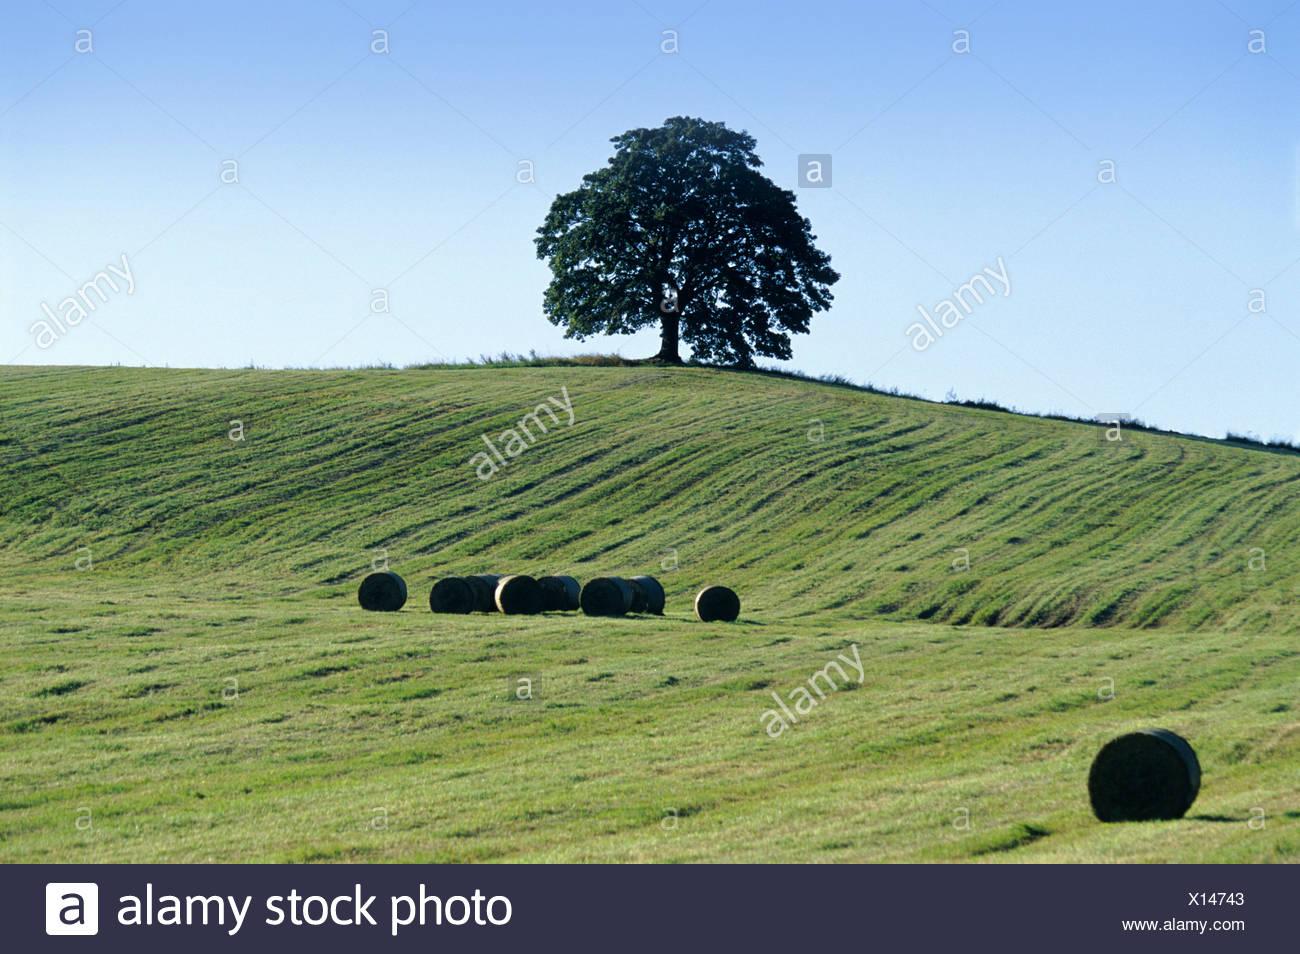 Agribusiness Agriculture Agronomy Bohemia Business Color Colour Crop Cultivation Culture Czech Republic Cze - Stock Image